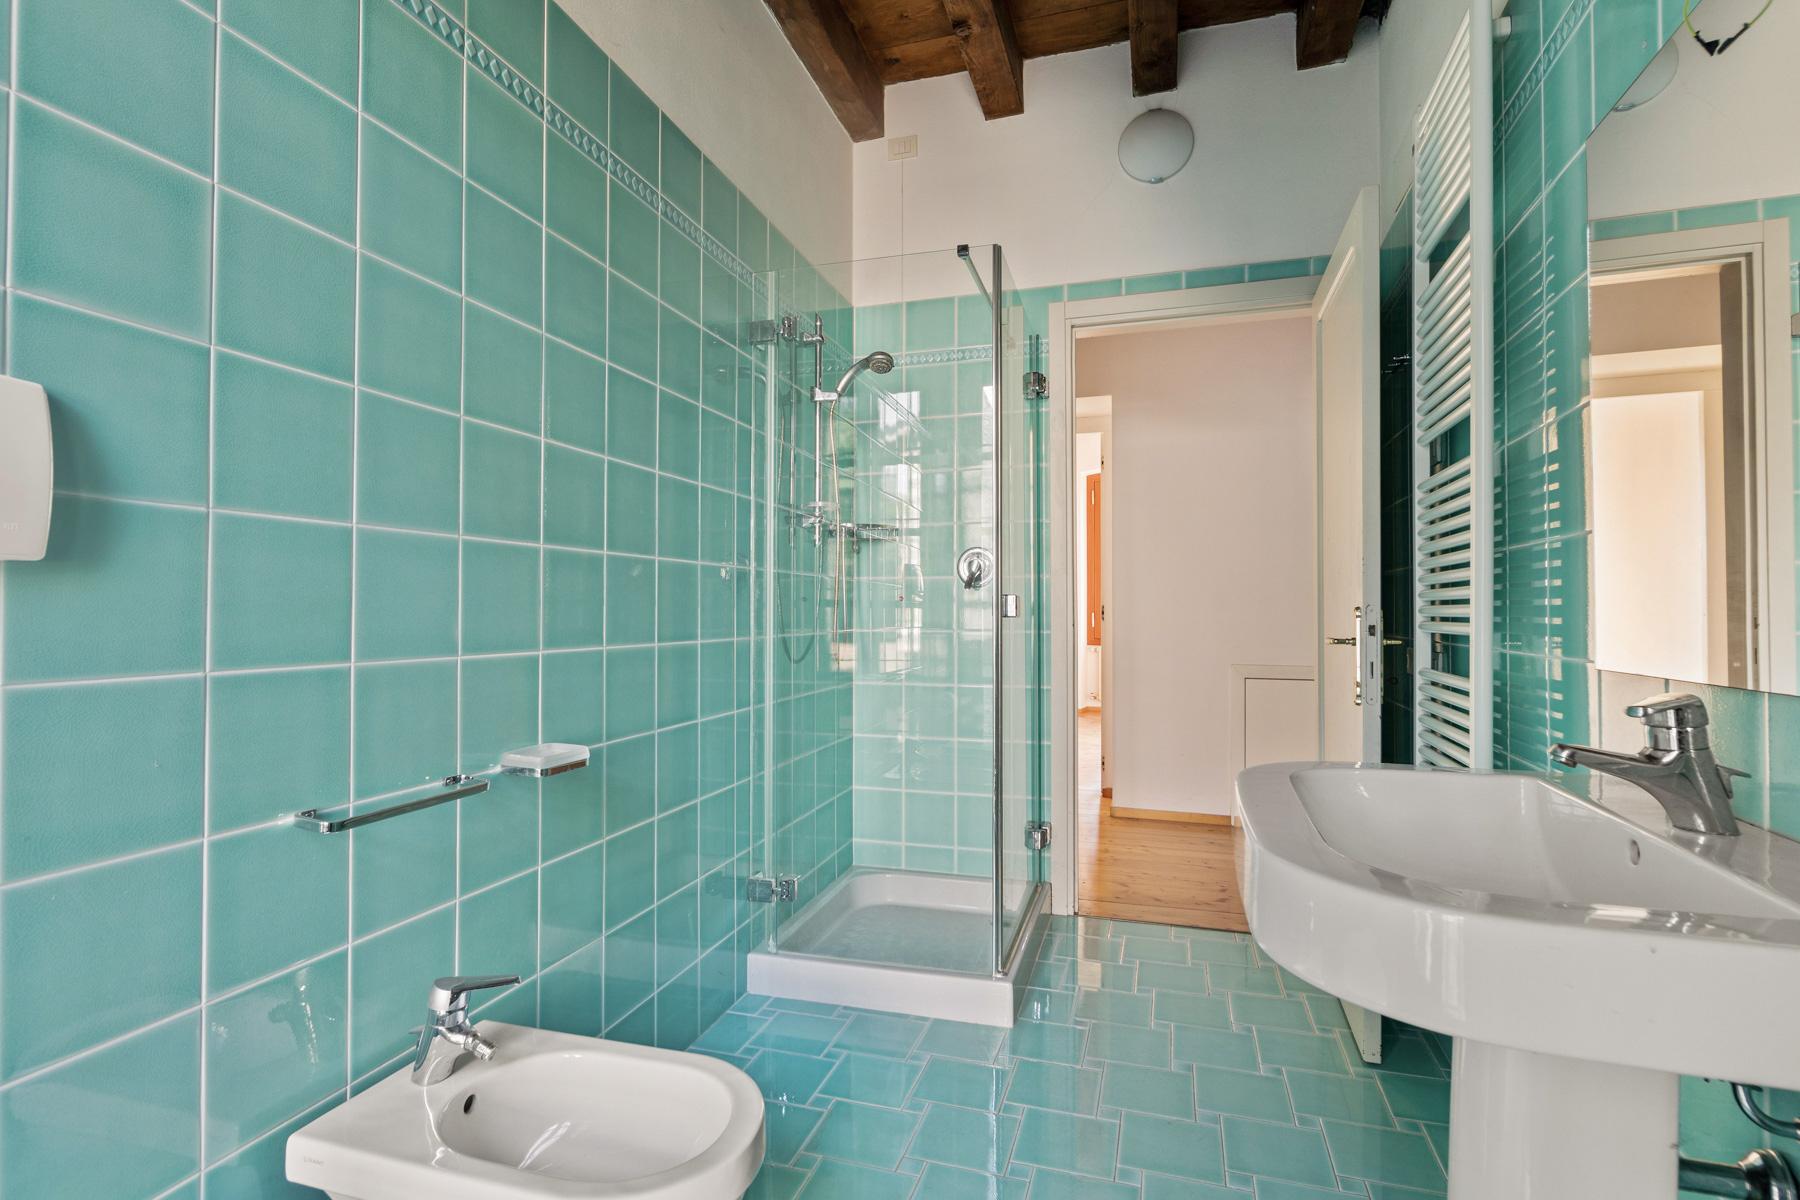 Villa in Vendita a Verona: 5 locali, 890 mq - Foto 19